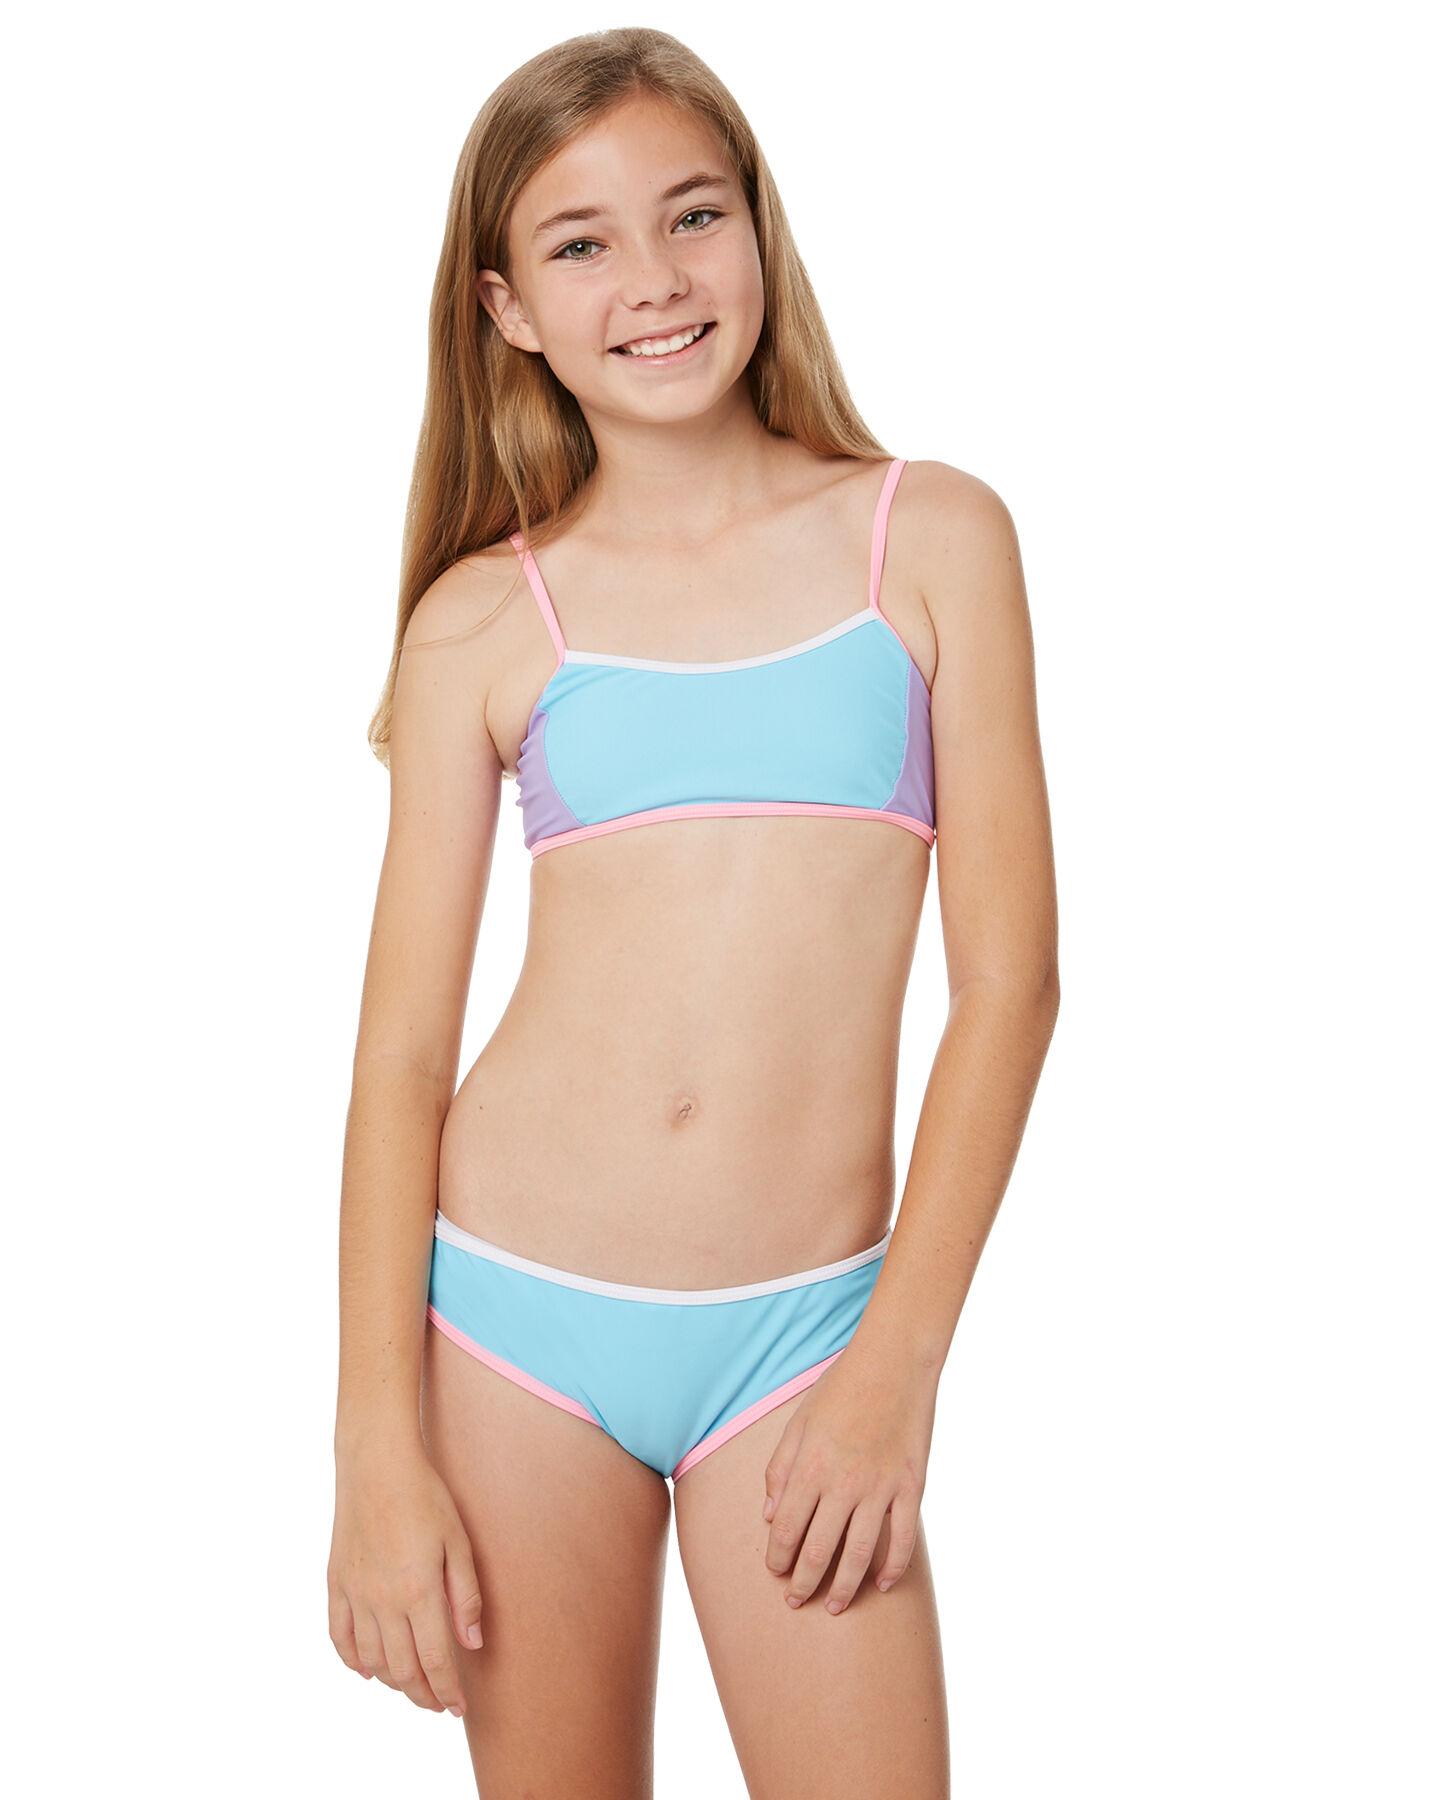 teens-panties-bikini